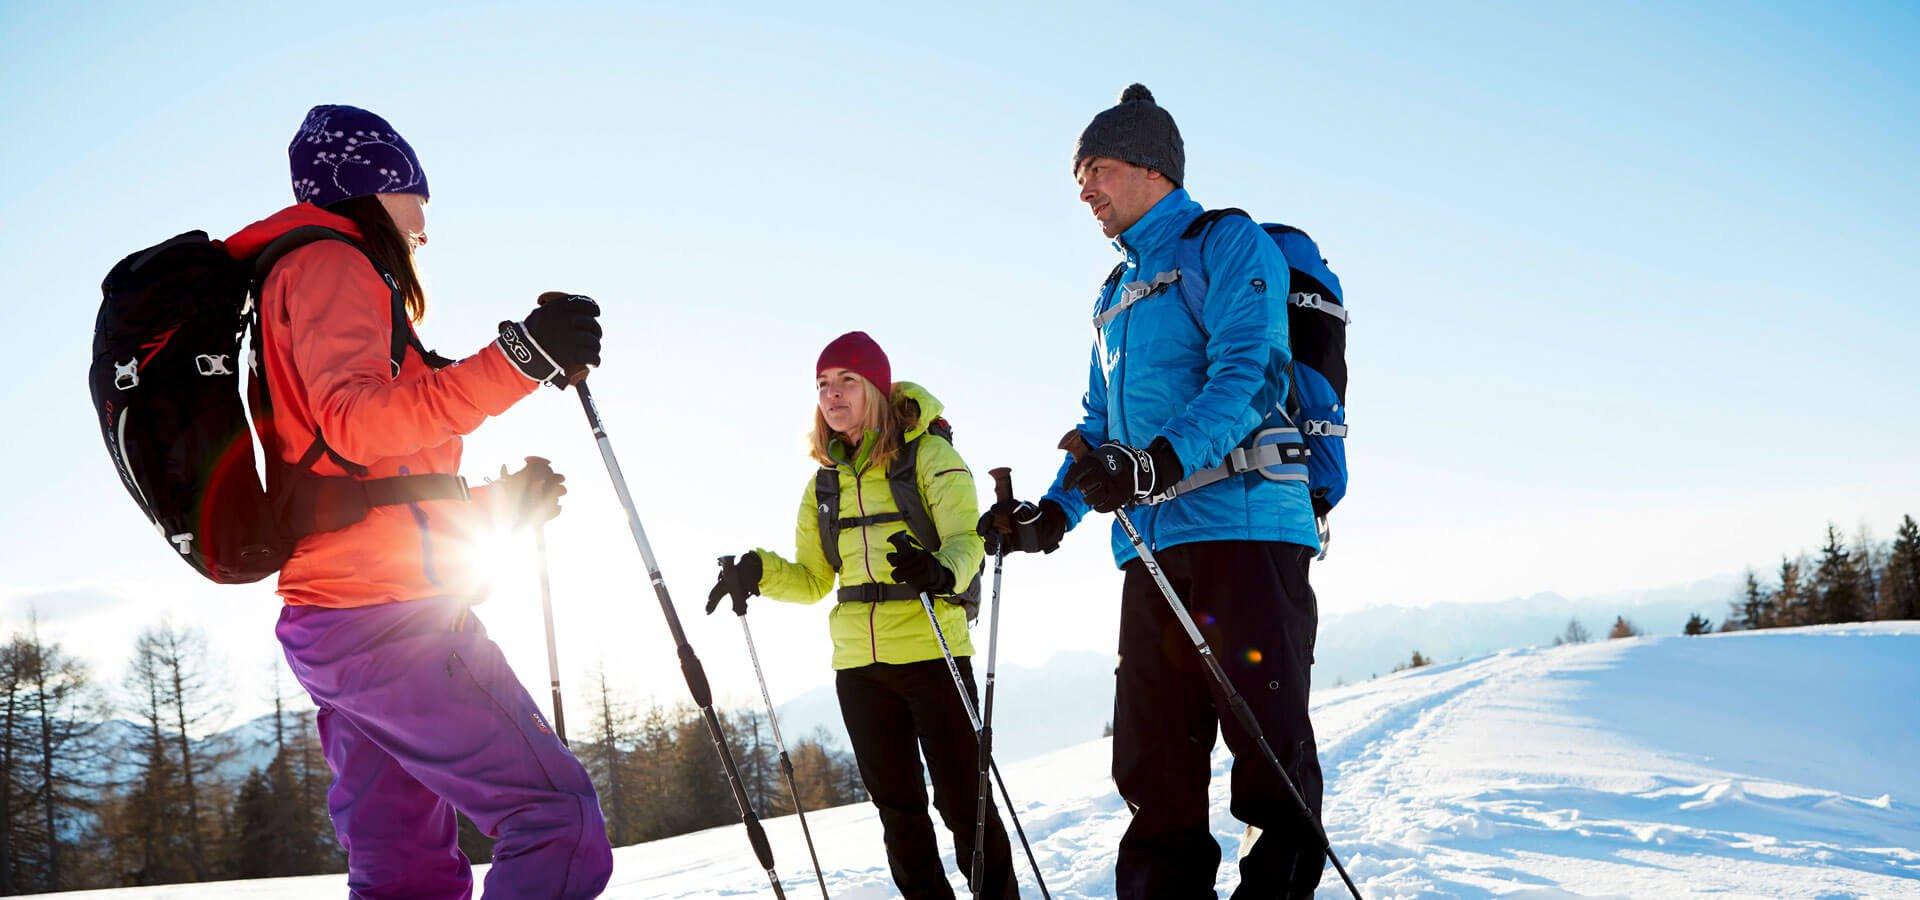 winterurlaub-suedtirol-schneeschuhwandern-watles-nauders